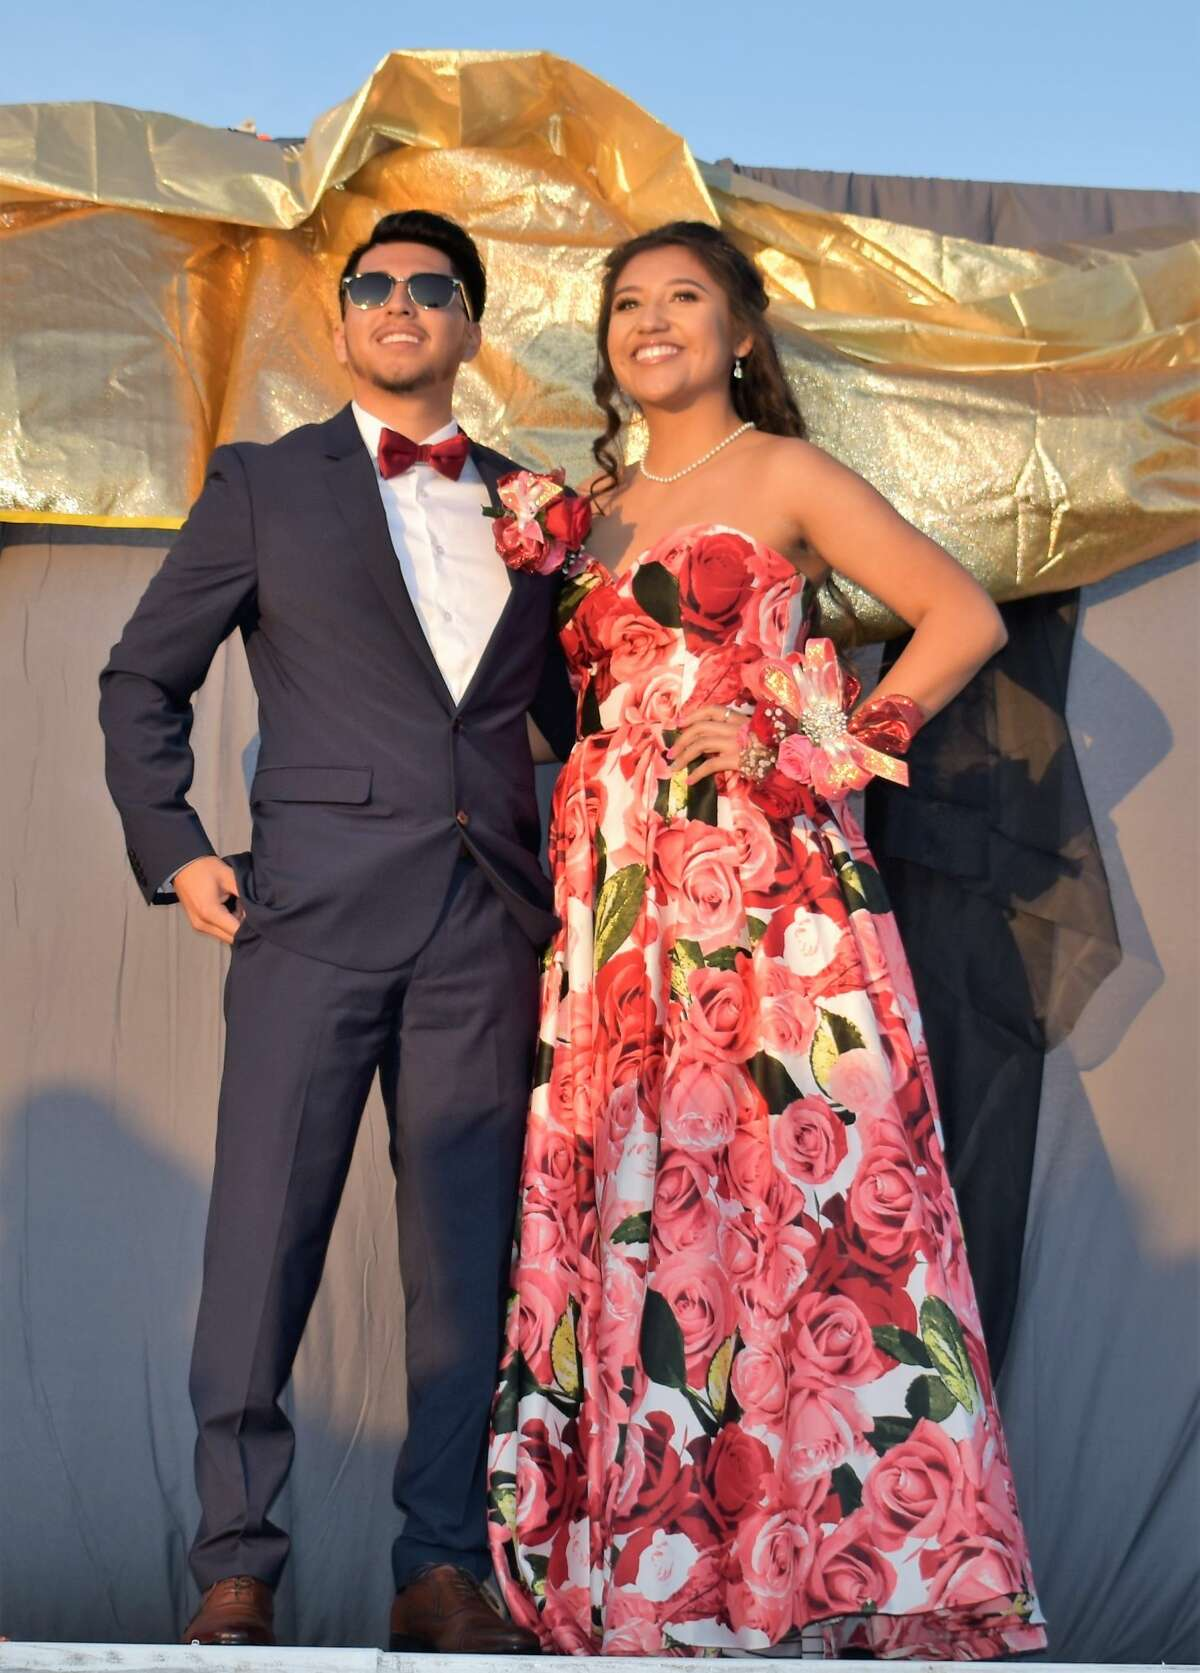 Plainview Prom 2019